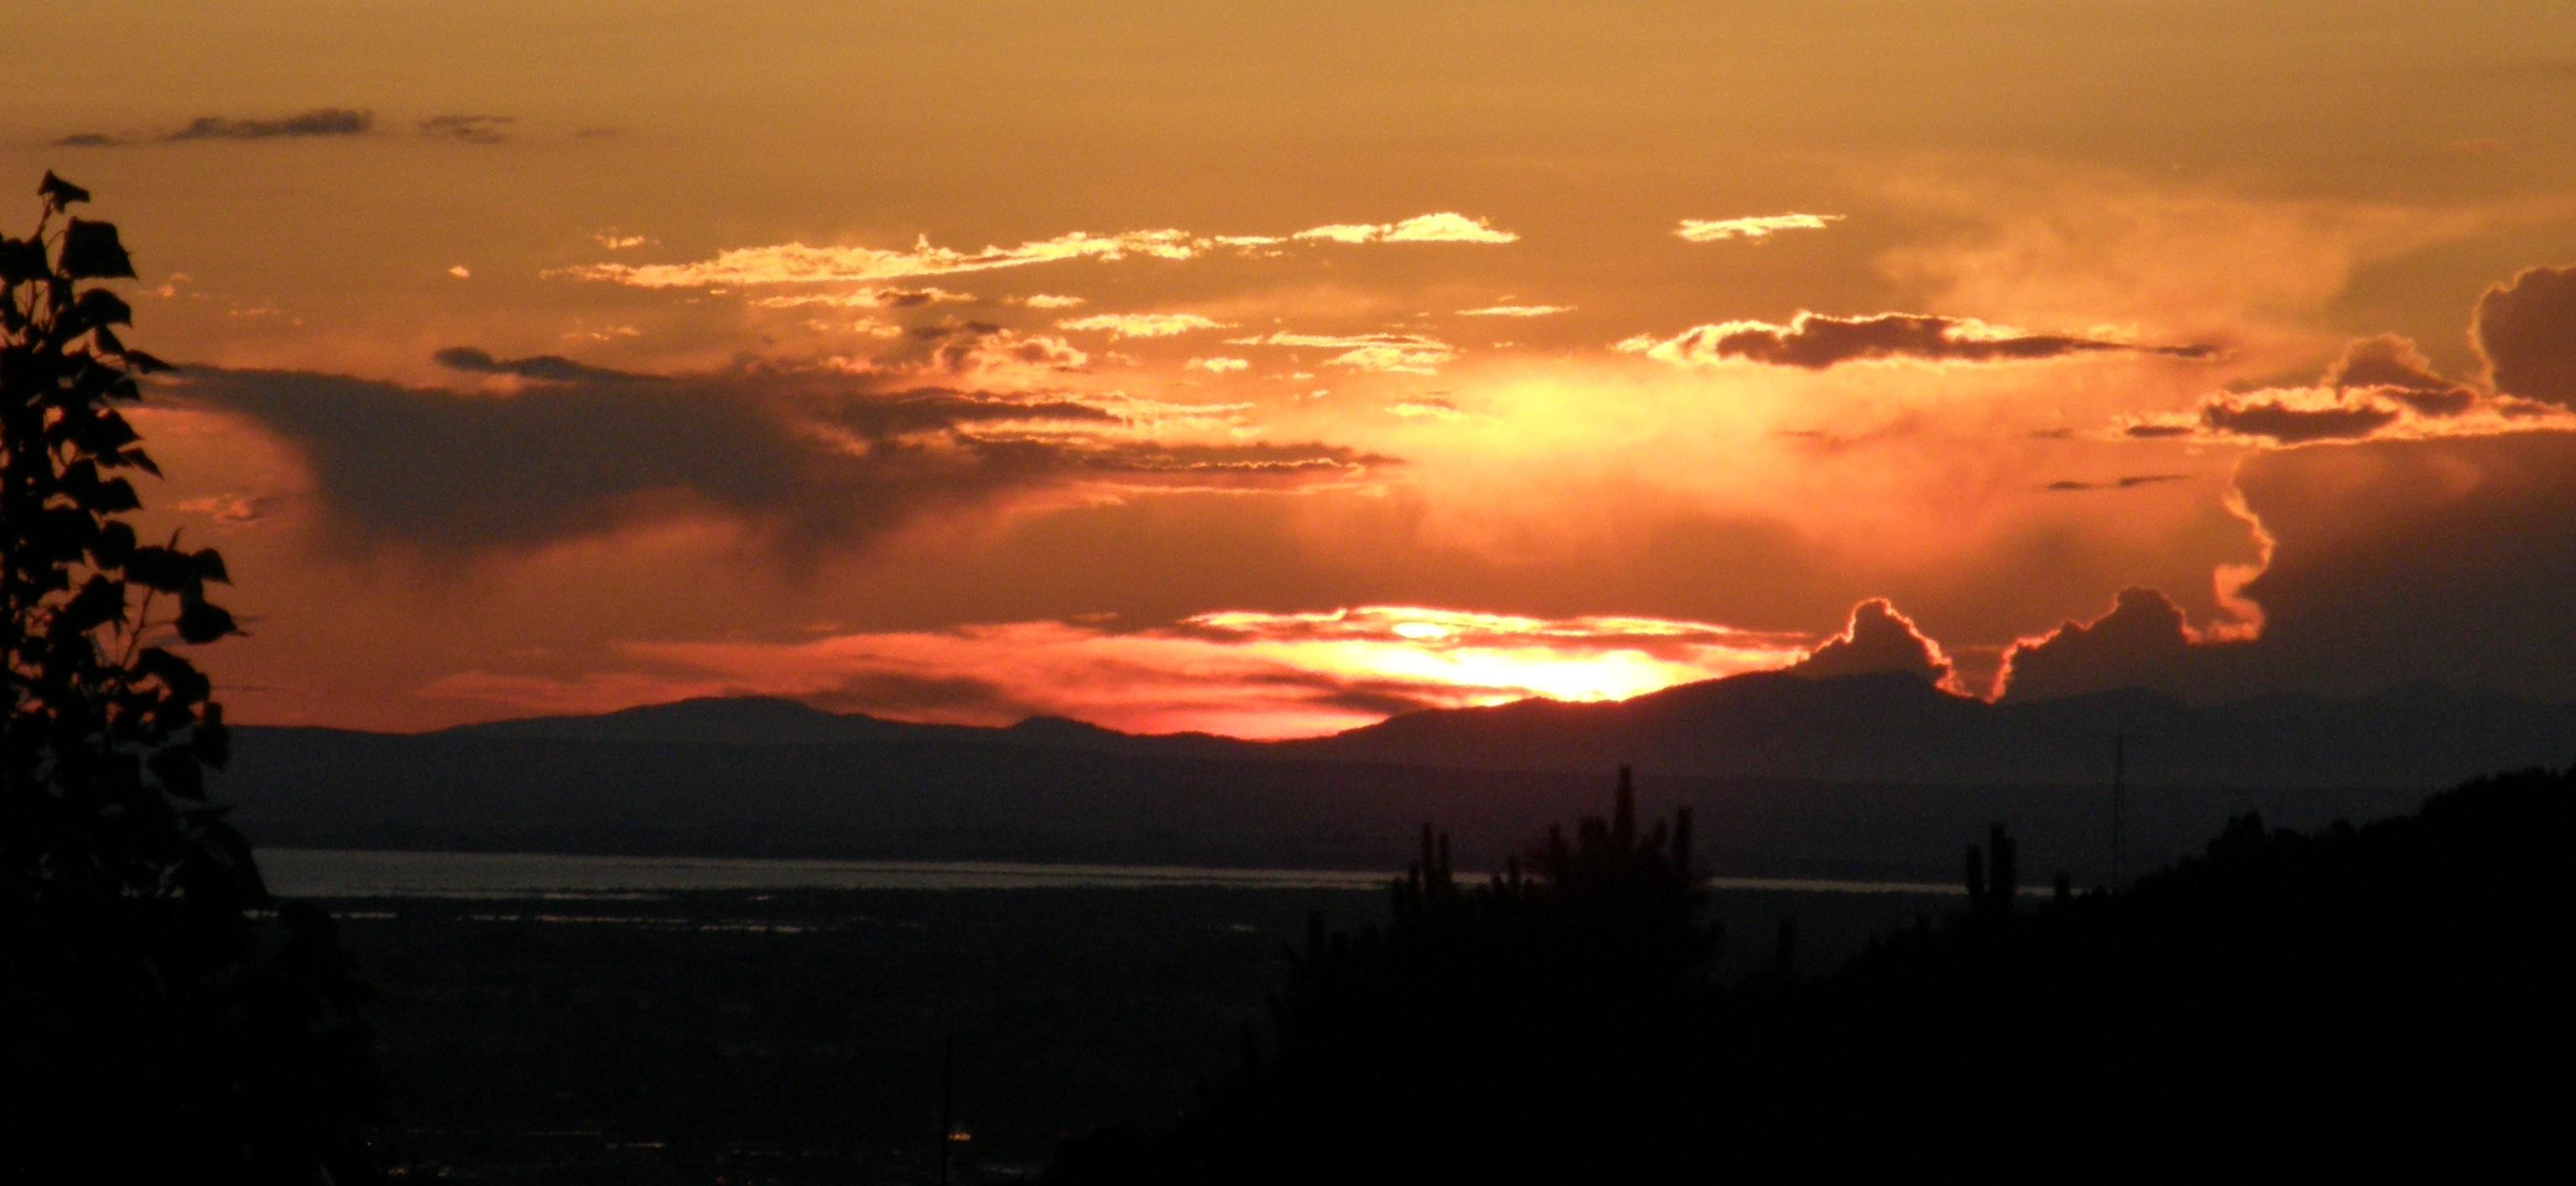 american falls reservoir sunset P7040127.JPG